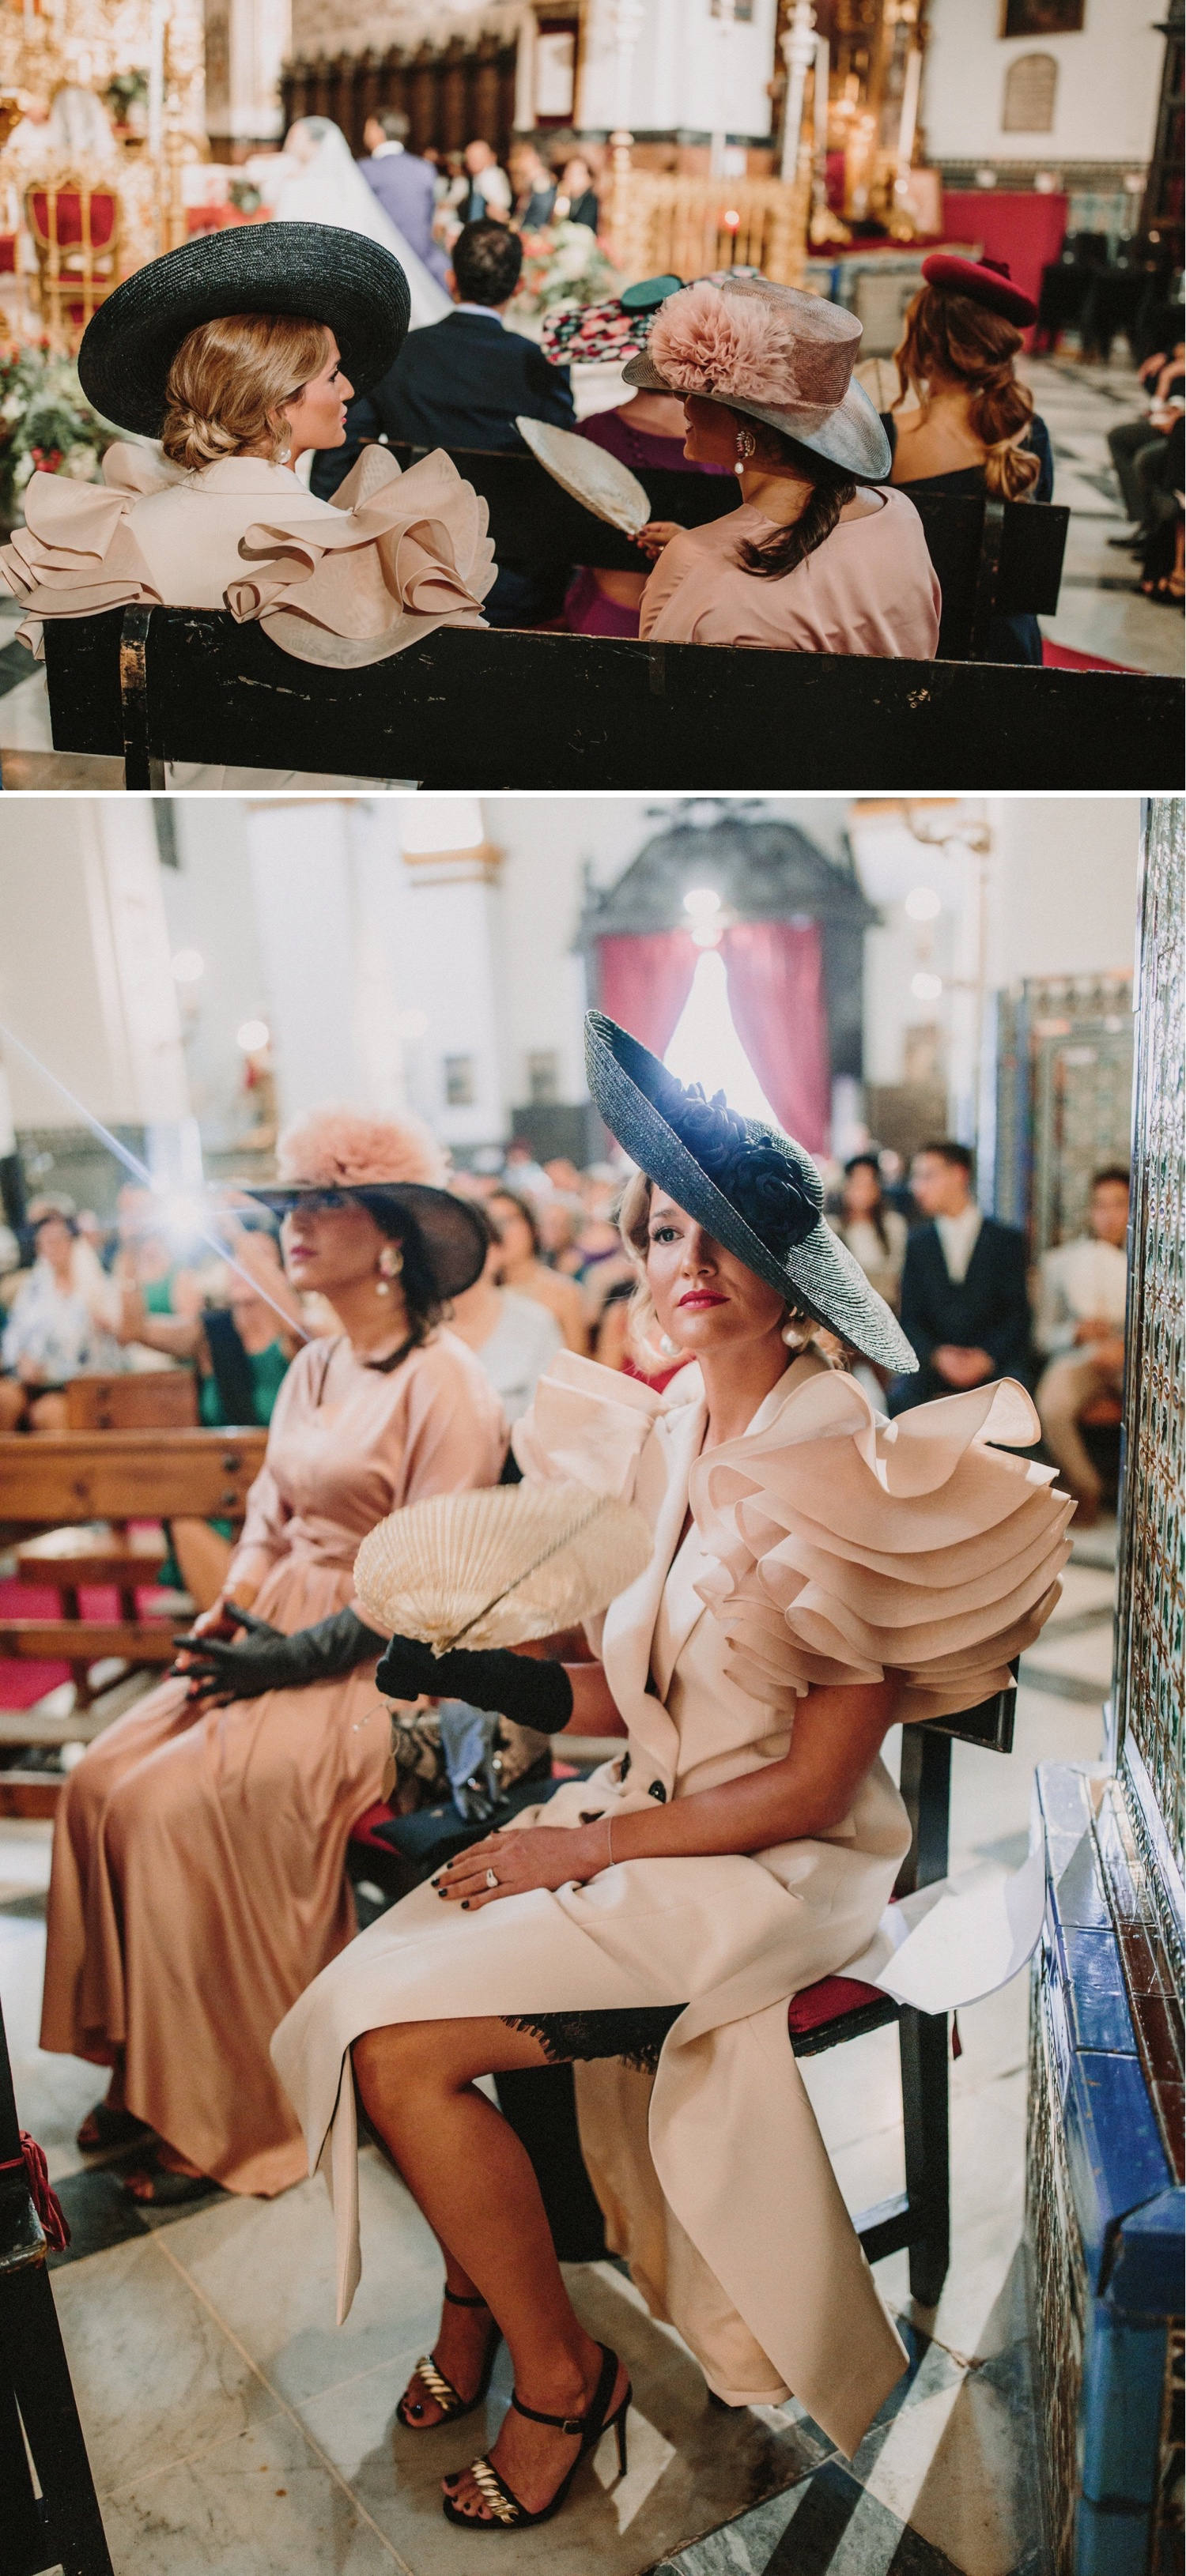 21_wedding-ernestovillalba-anabel-diego-1647-ASE_wedding-ernestovillalba-anabel-diego-1638-ASE.jpg